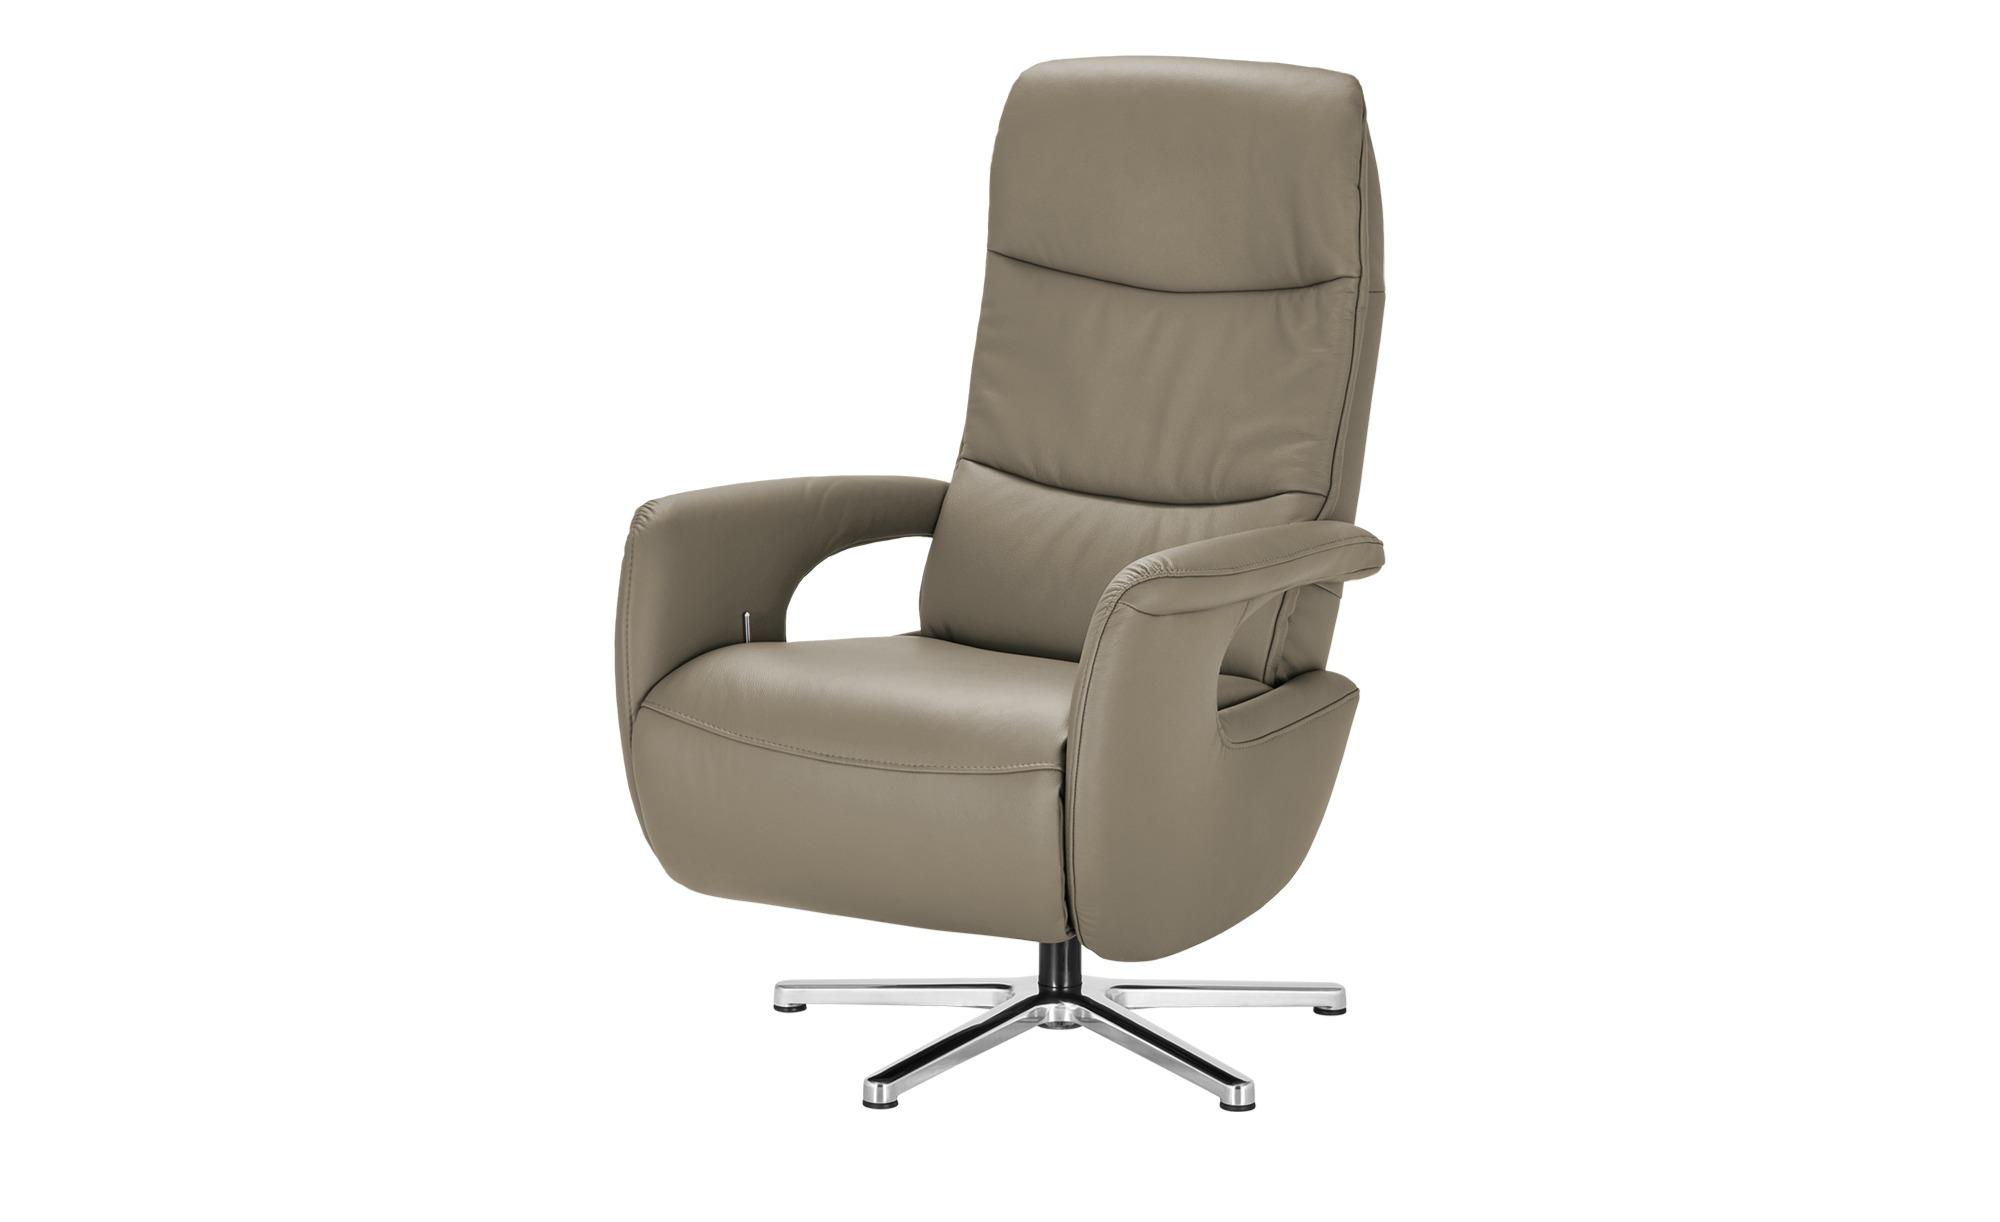 Hukla Relaxsessel  Enno ¦ braun ¦ Maße (cm): B: 72 H: 110 T: 85 Polstermöbel > Sessel > Fernsehsessel - Höffner